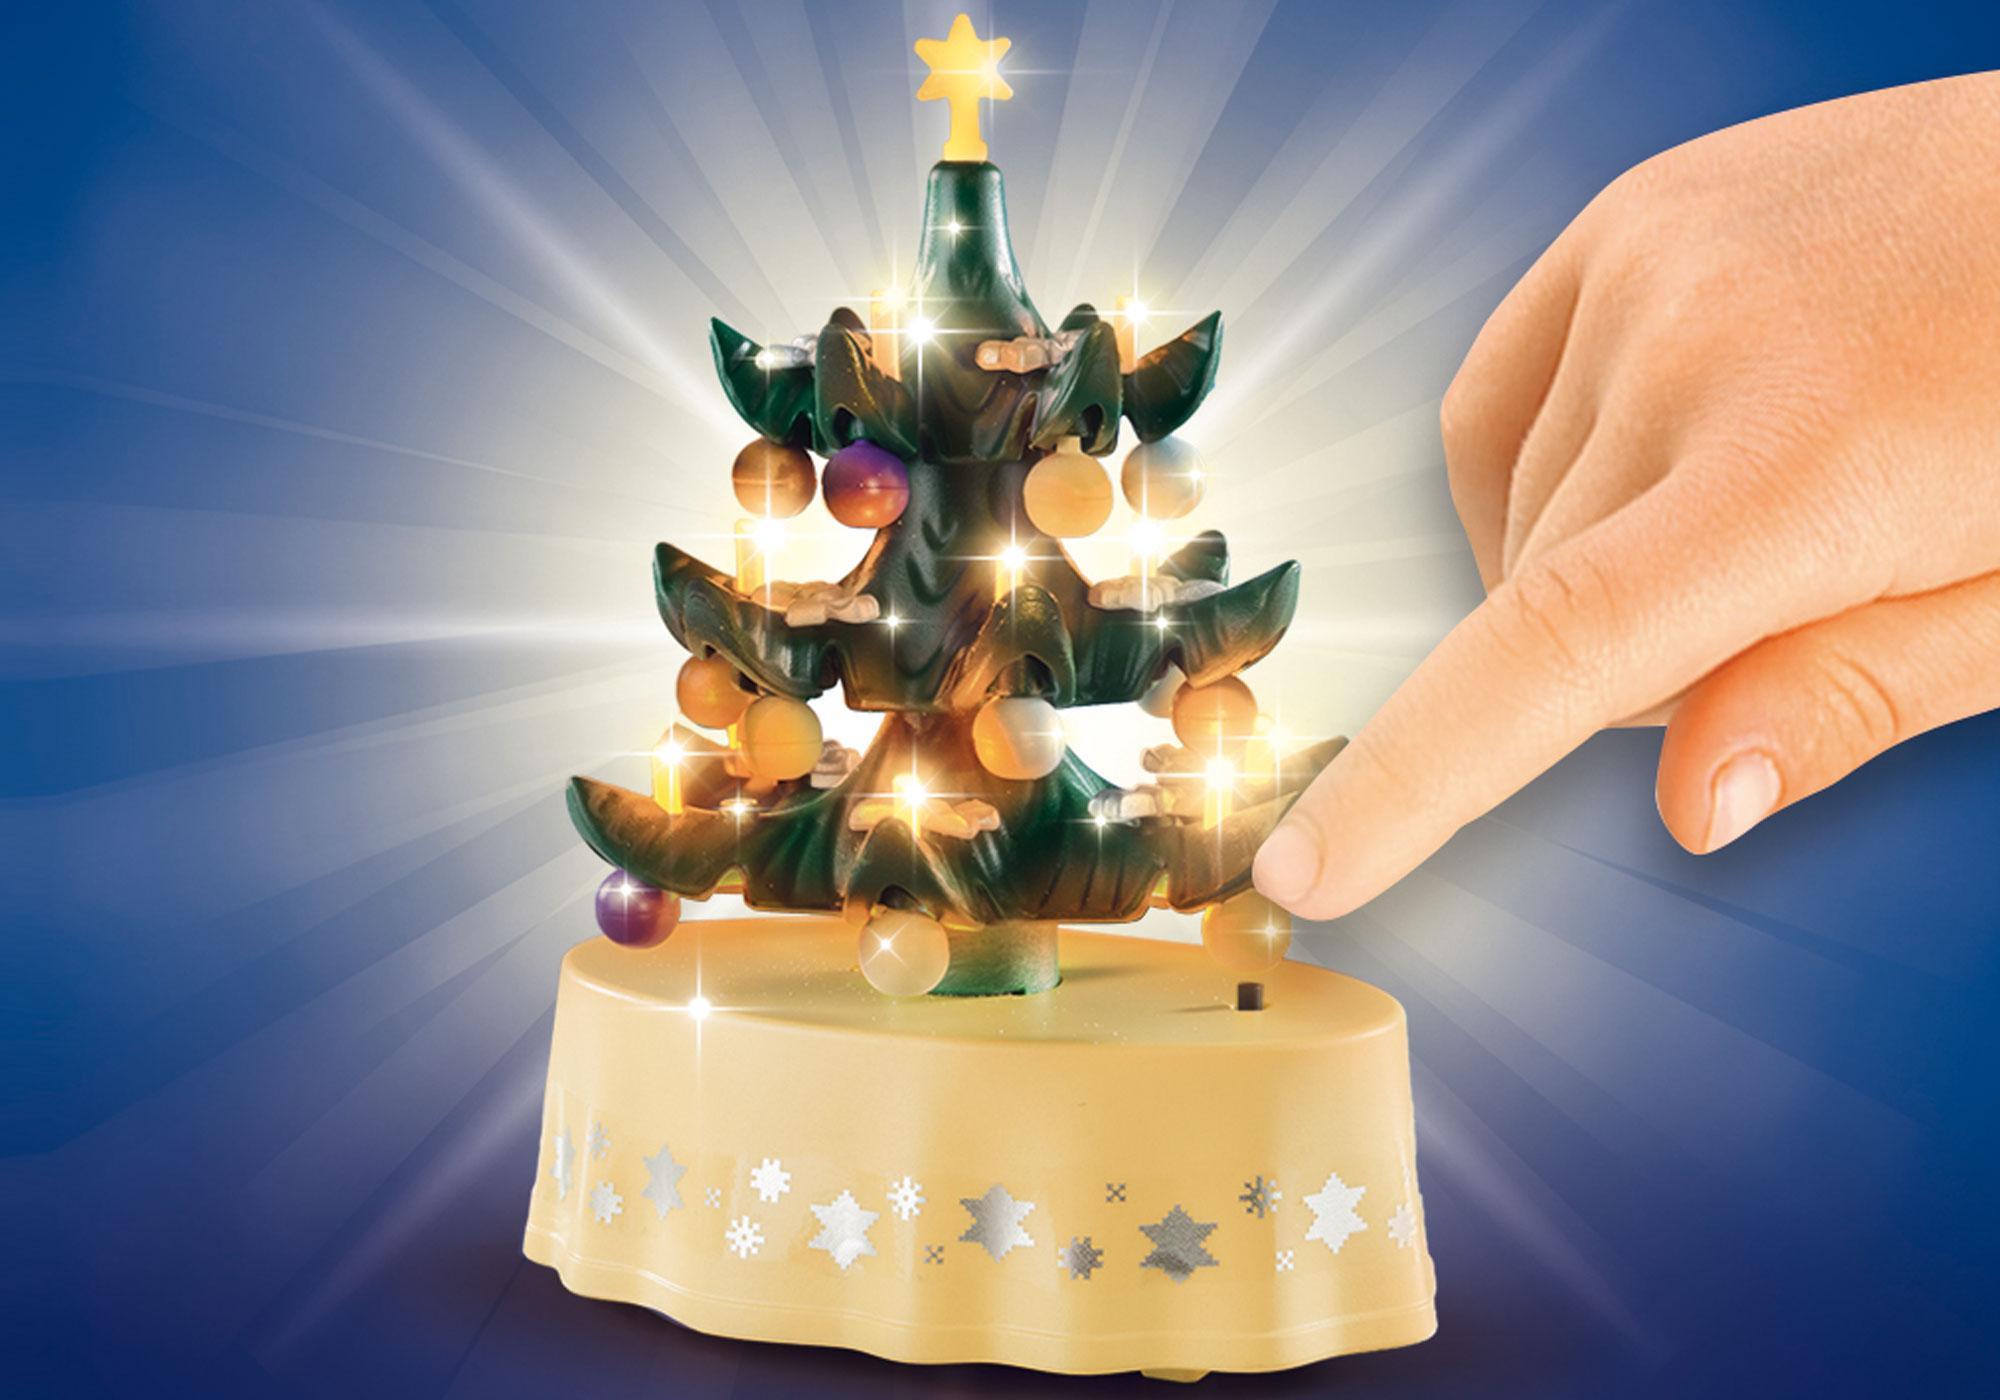 http://media.playmobil.com/i/playmobil/9495_product_extra1/Famille et salon de Noël